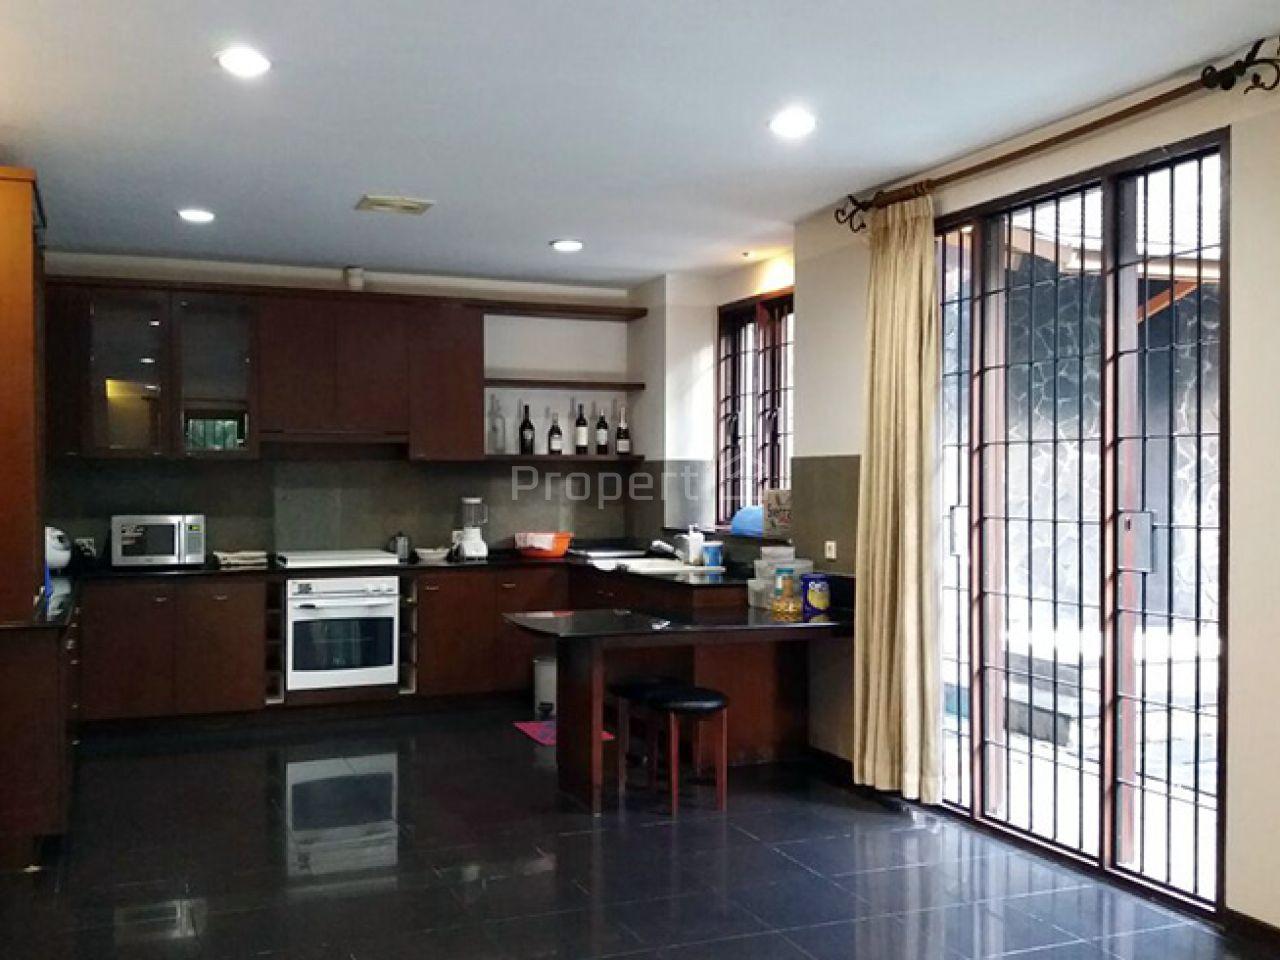 Rumah Elok dengan Nuansa Alami Modern dan Pekarangan Sangat Luas, Kota Bandung